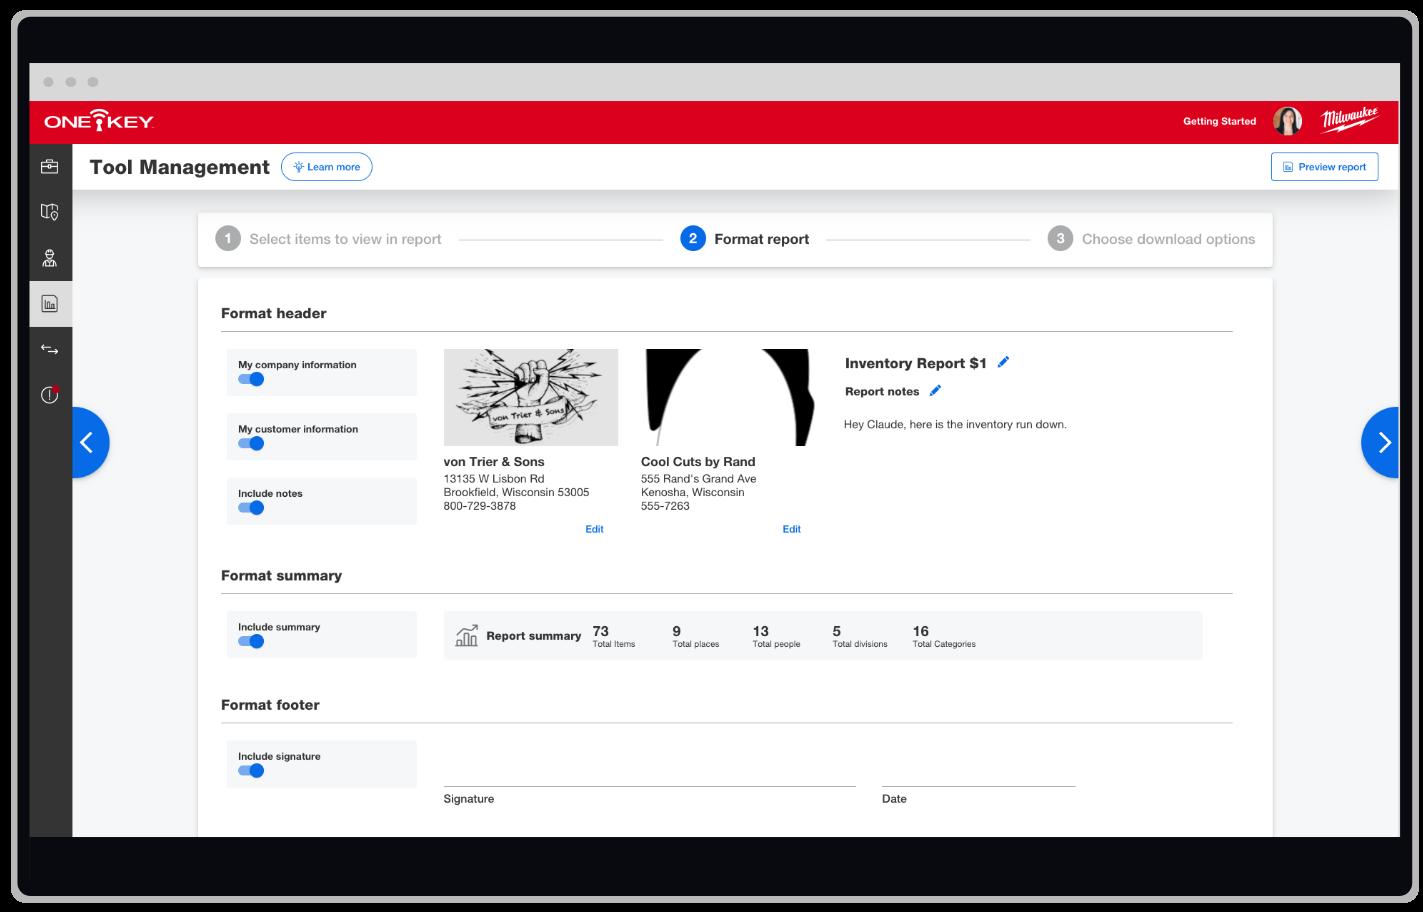 One-Key web app displays tool management report formatting